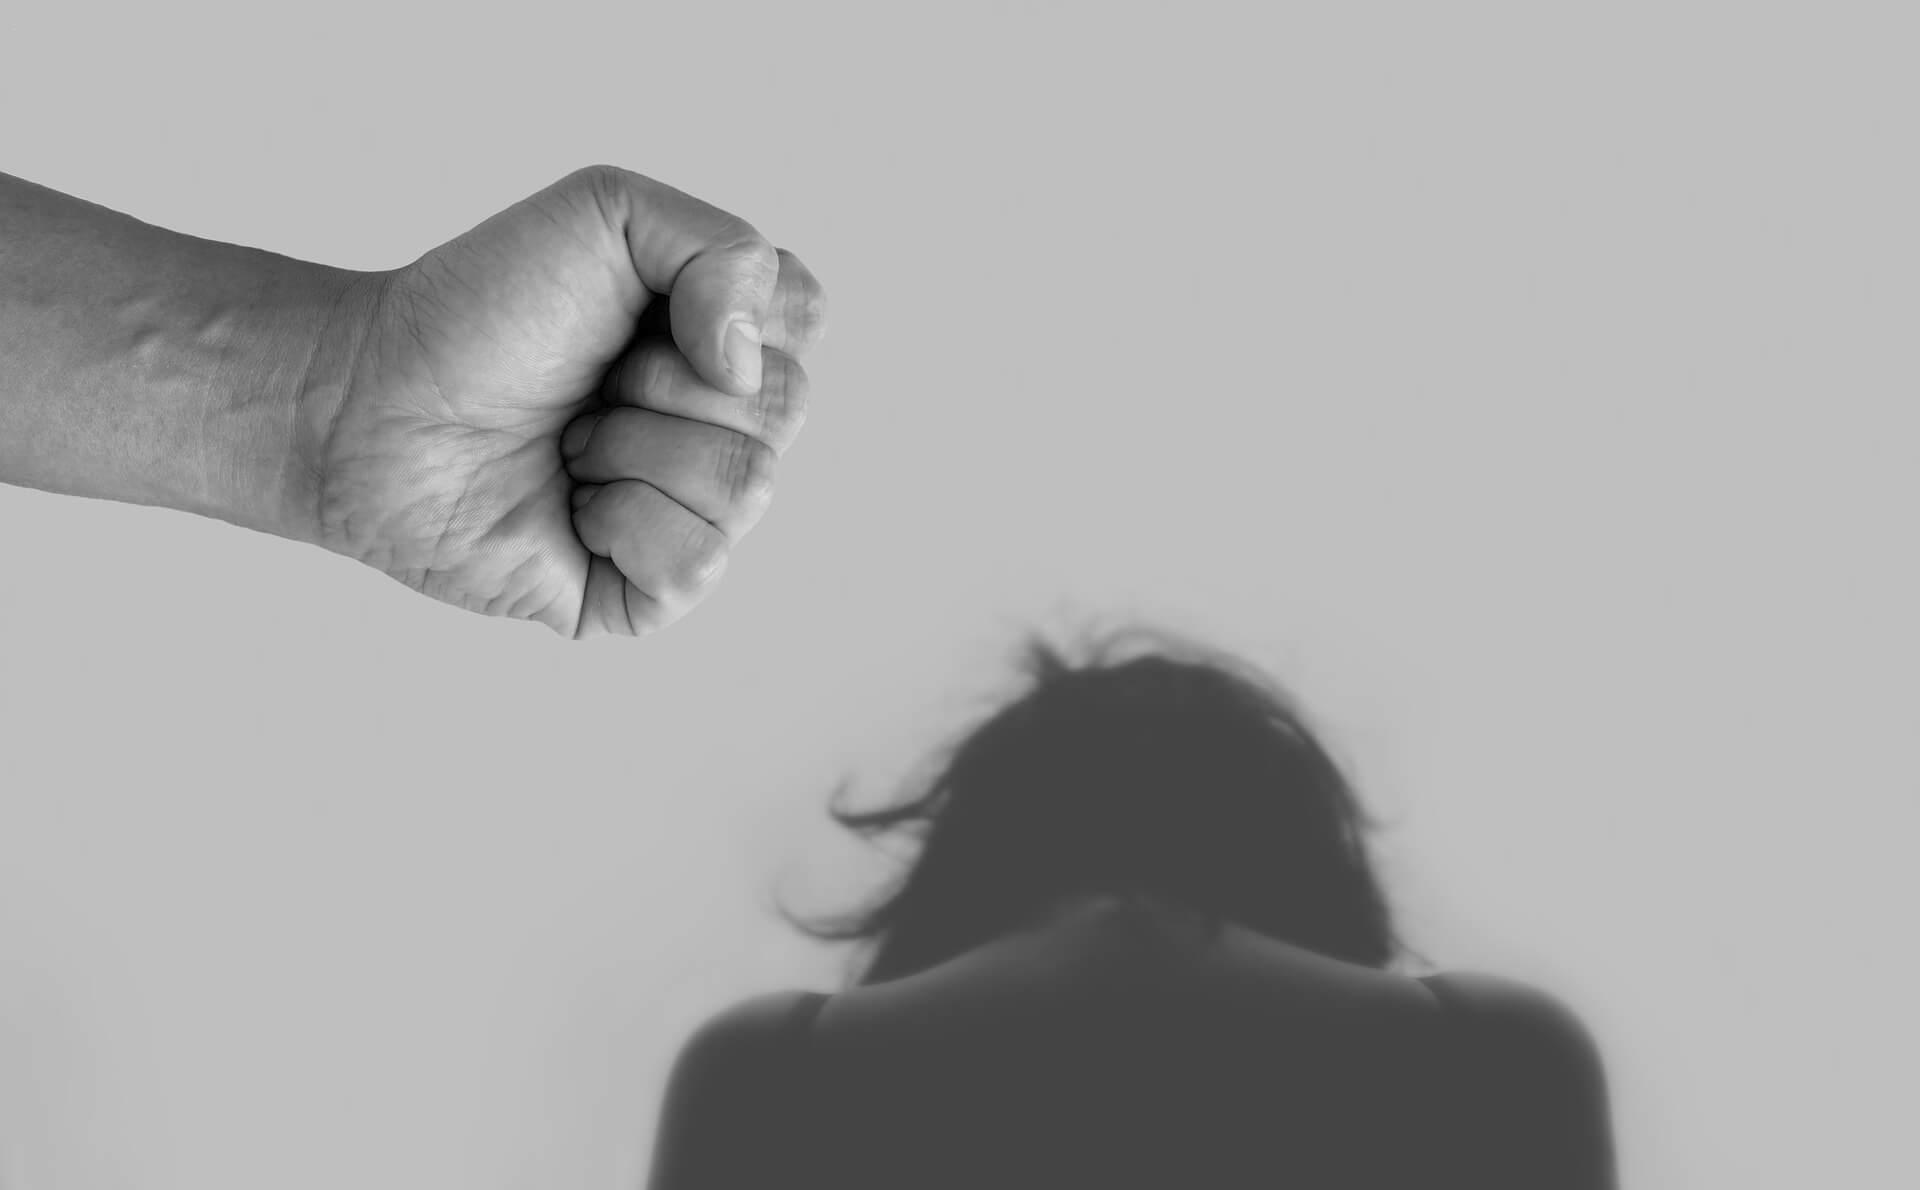 violence-against-women-4209778_1920